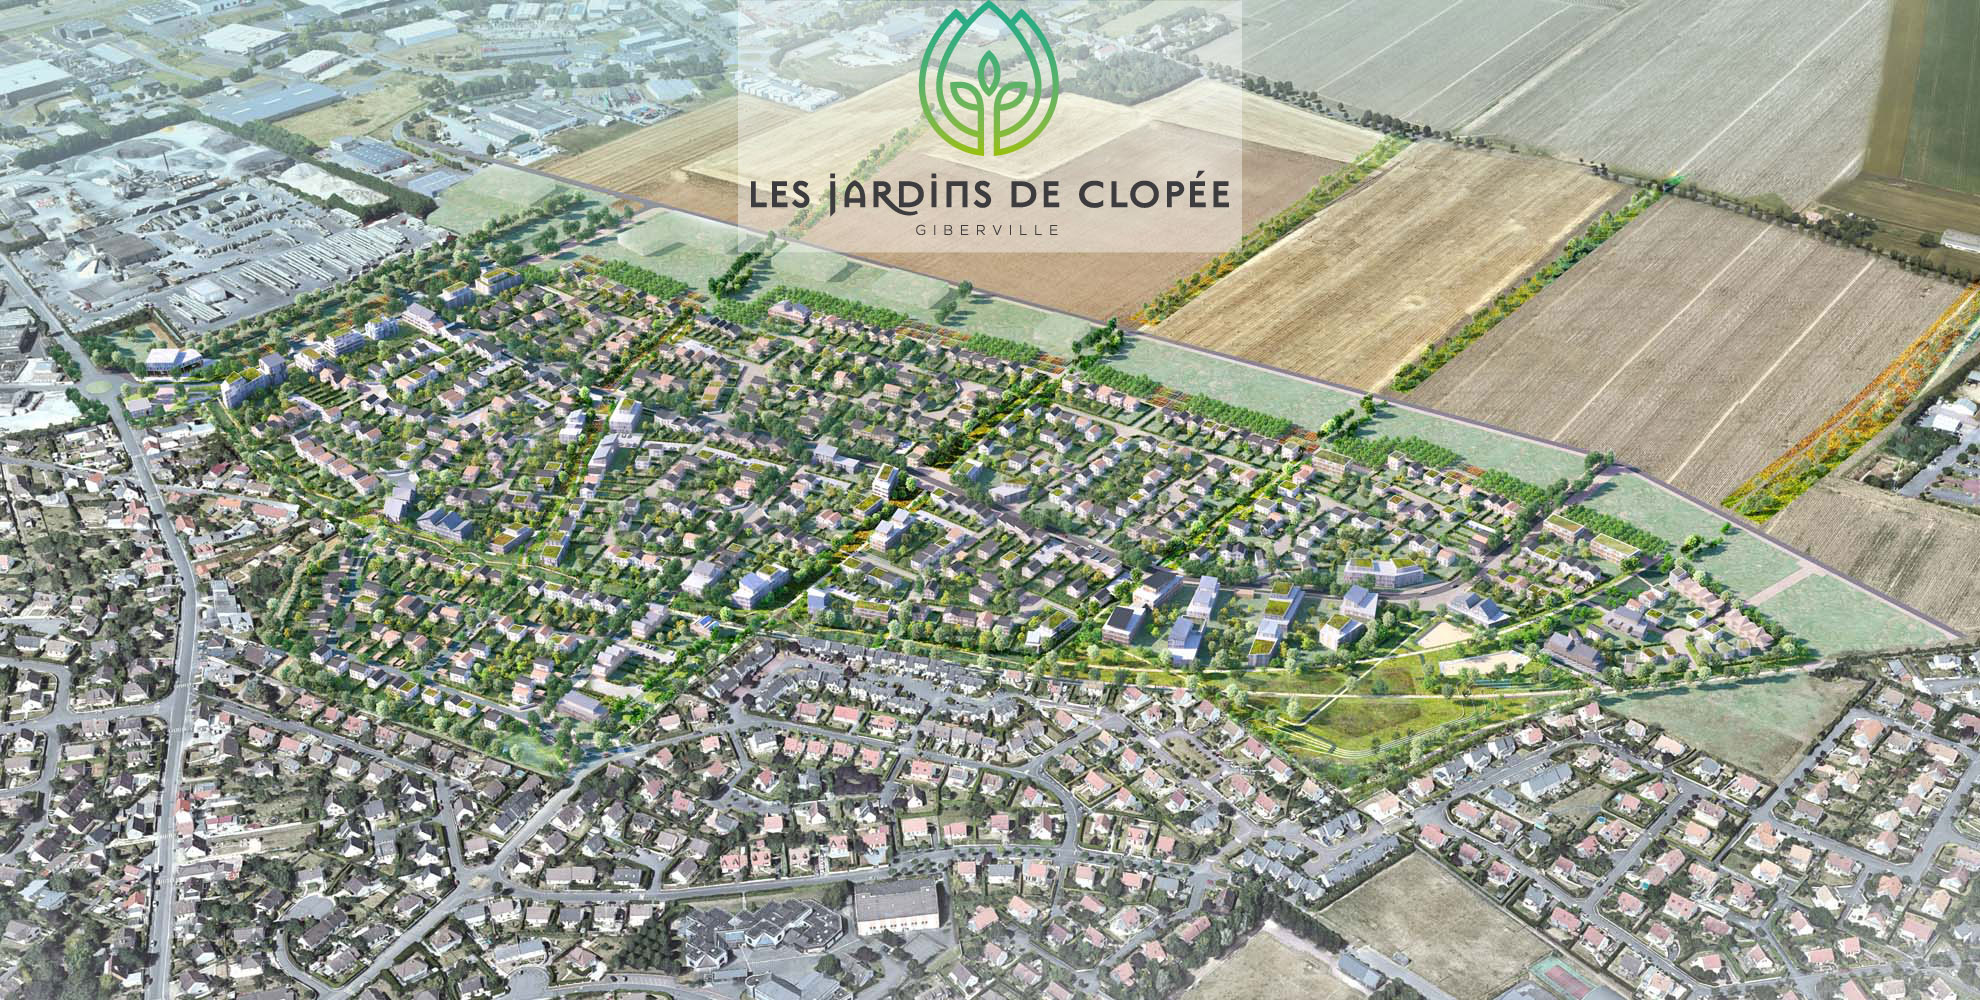 giberville-jardins-de-clopee-normandie-amenagement-habitat-terrains-a-batir-1